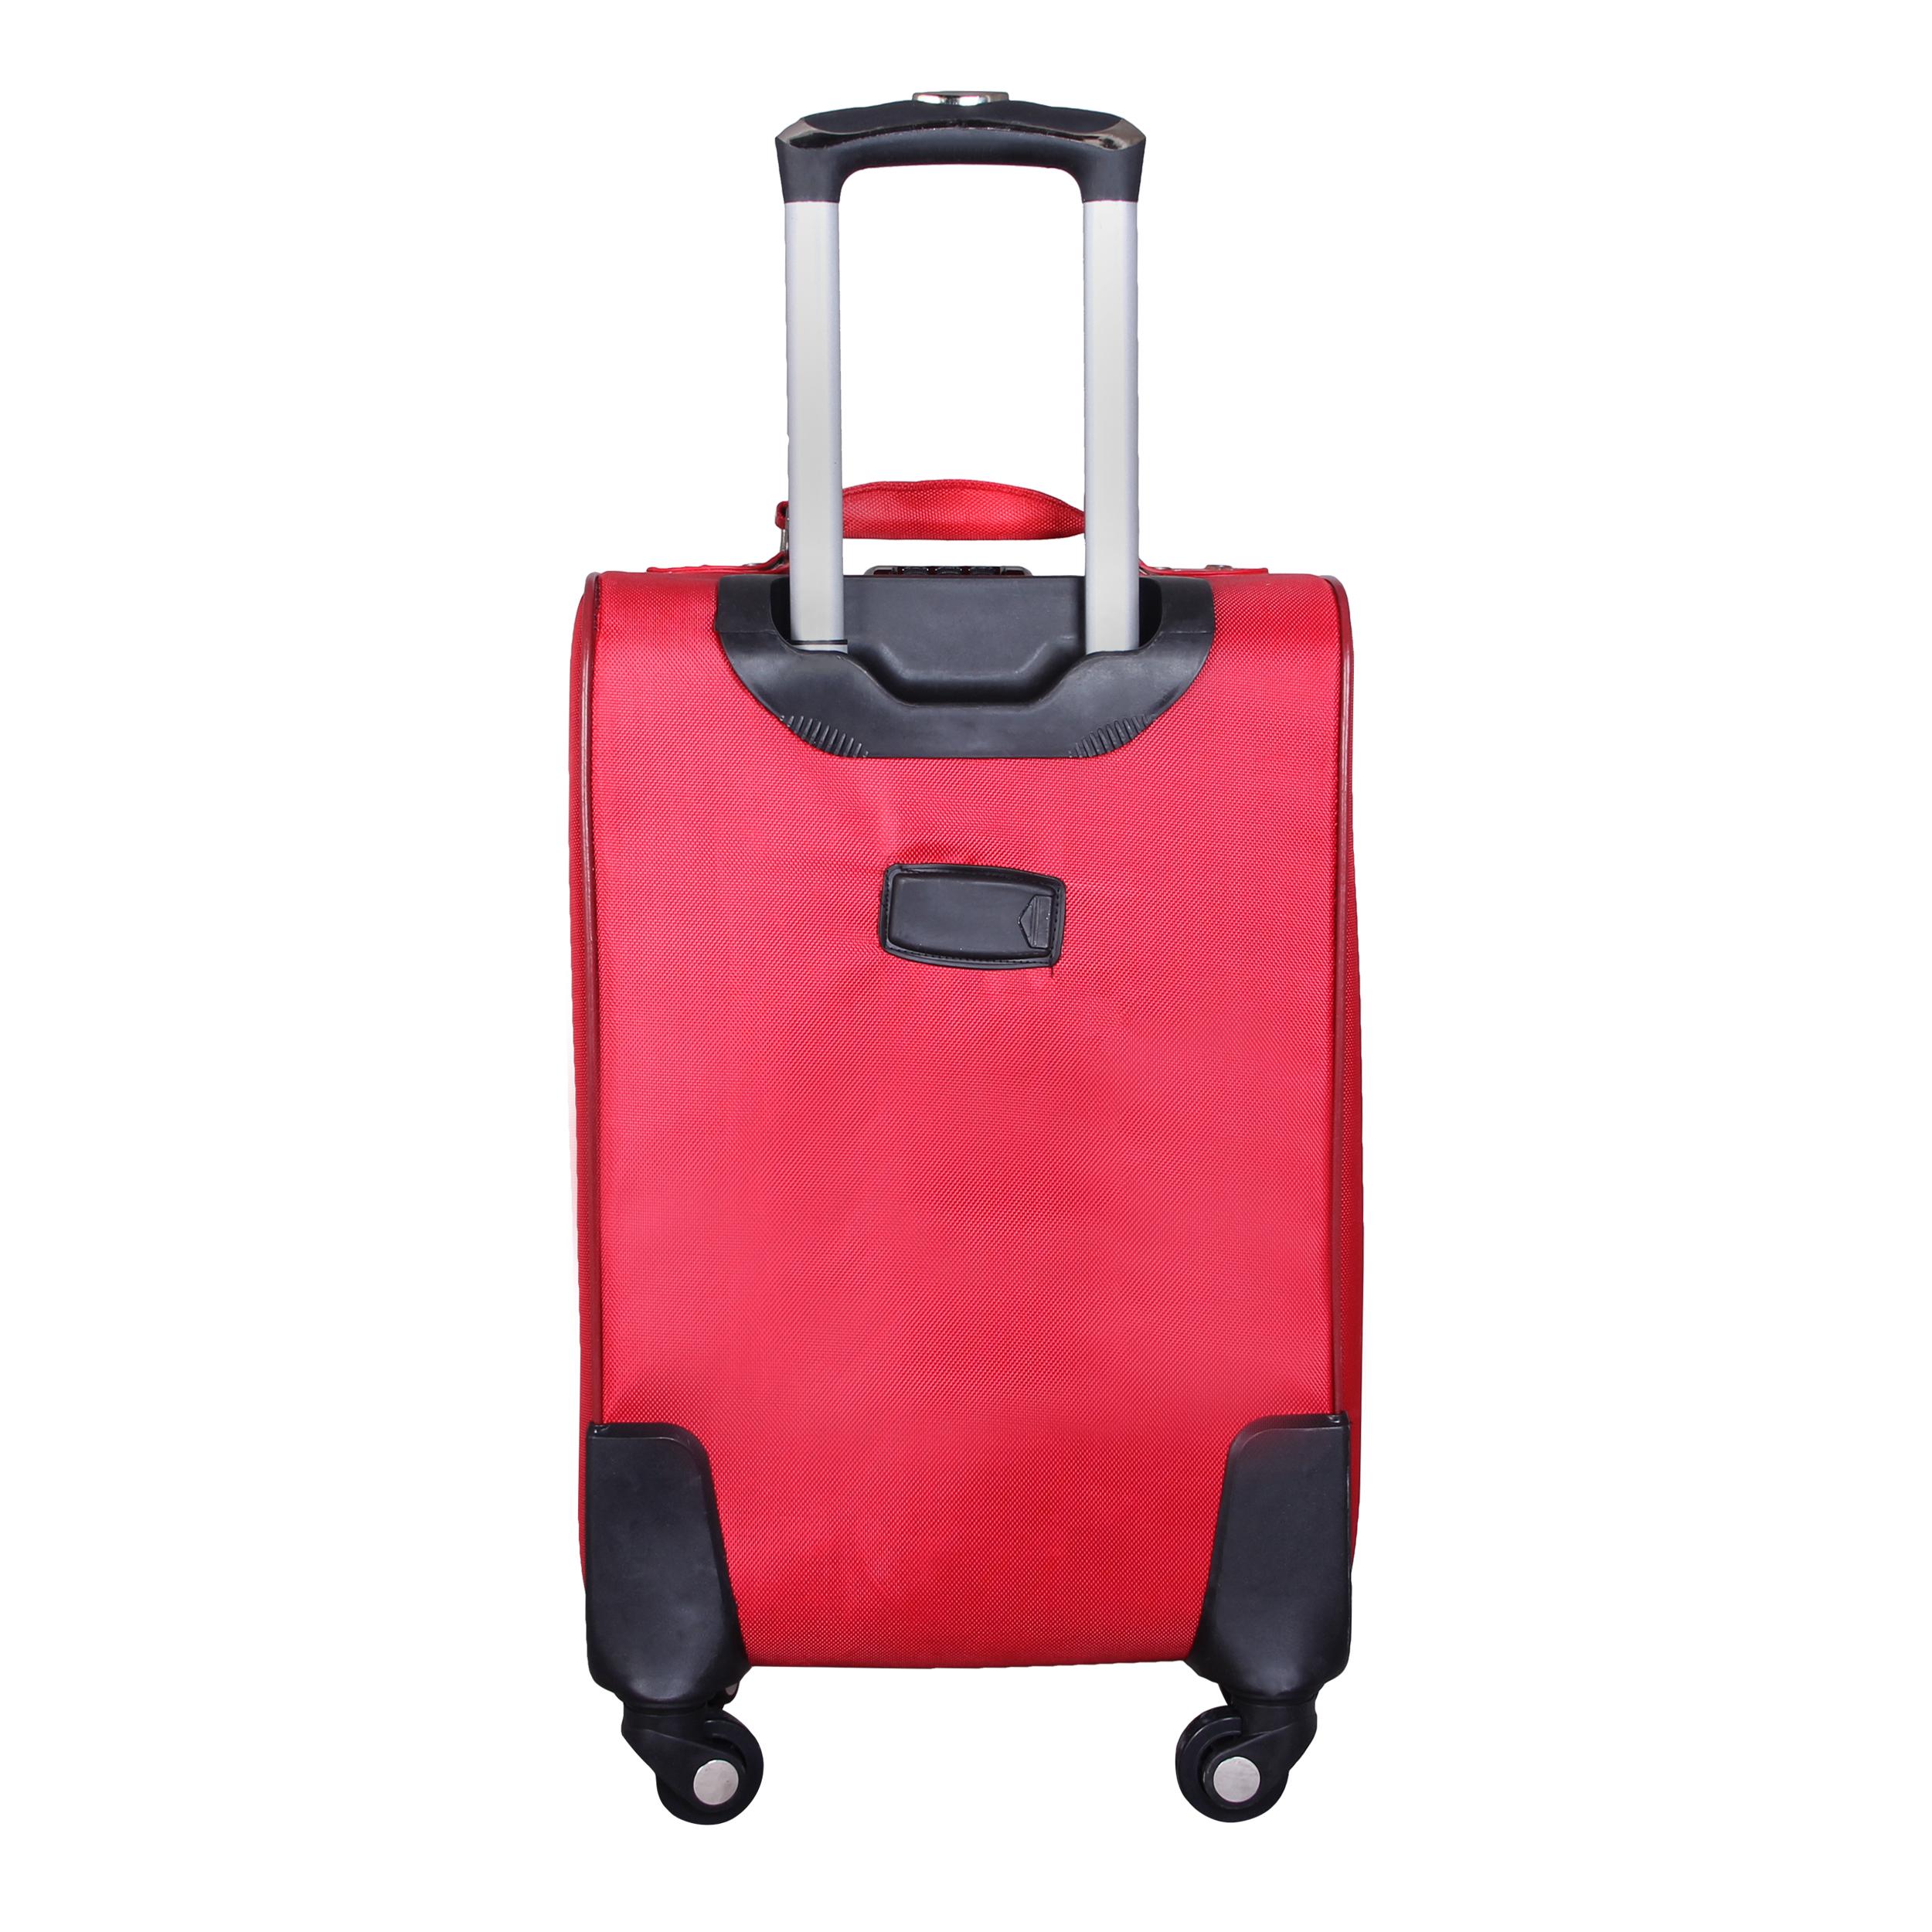 مجموعه سه عددی چمدان کدA1034 main 1 10